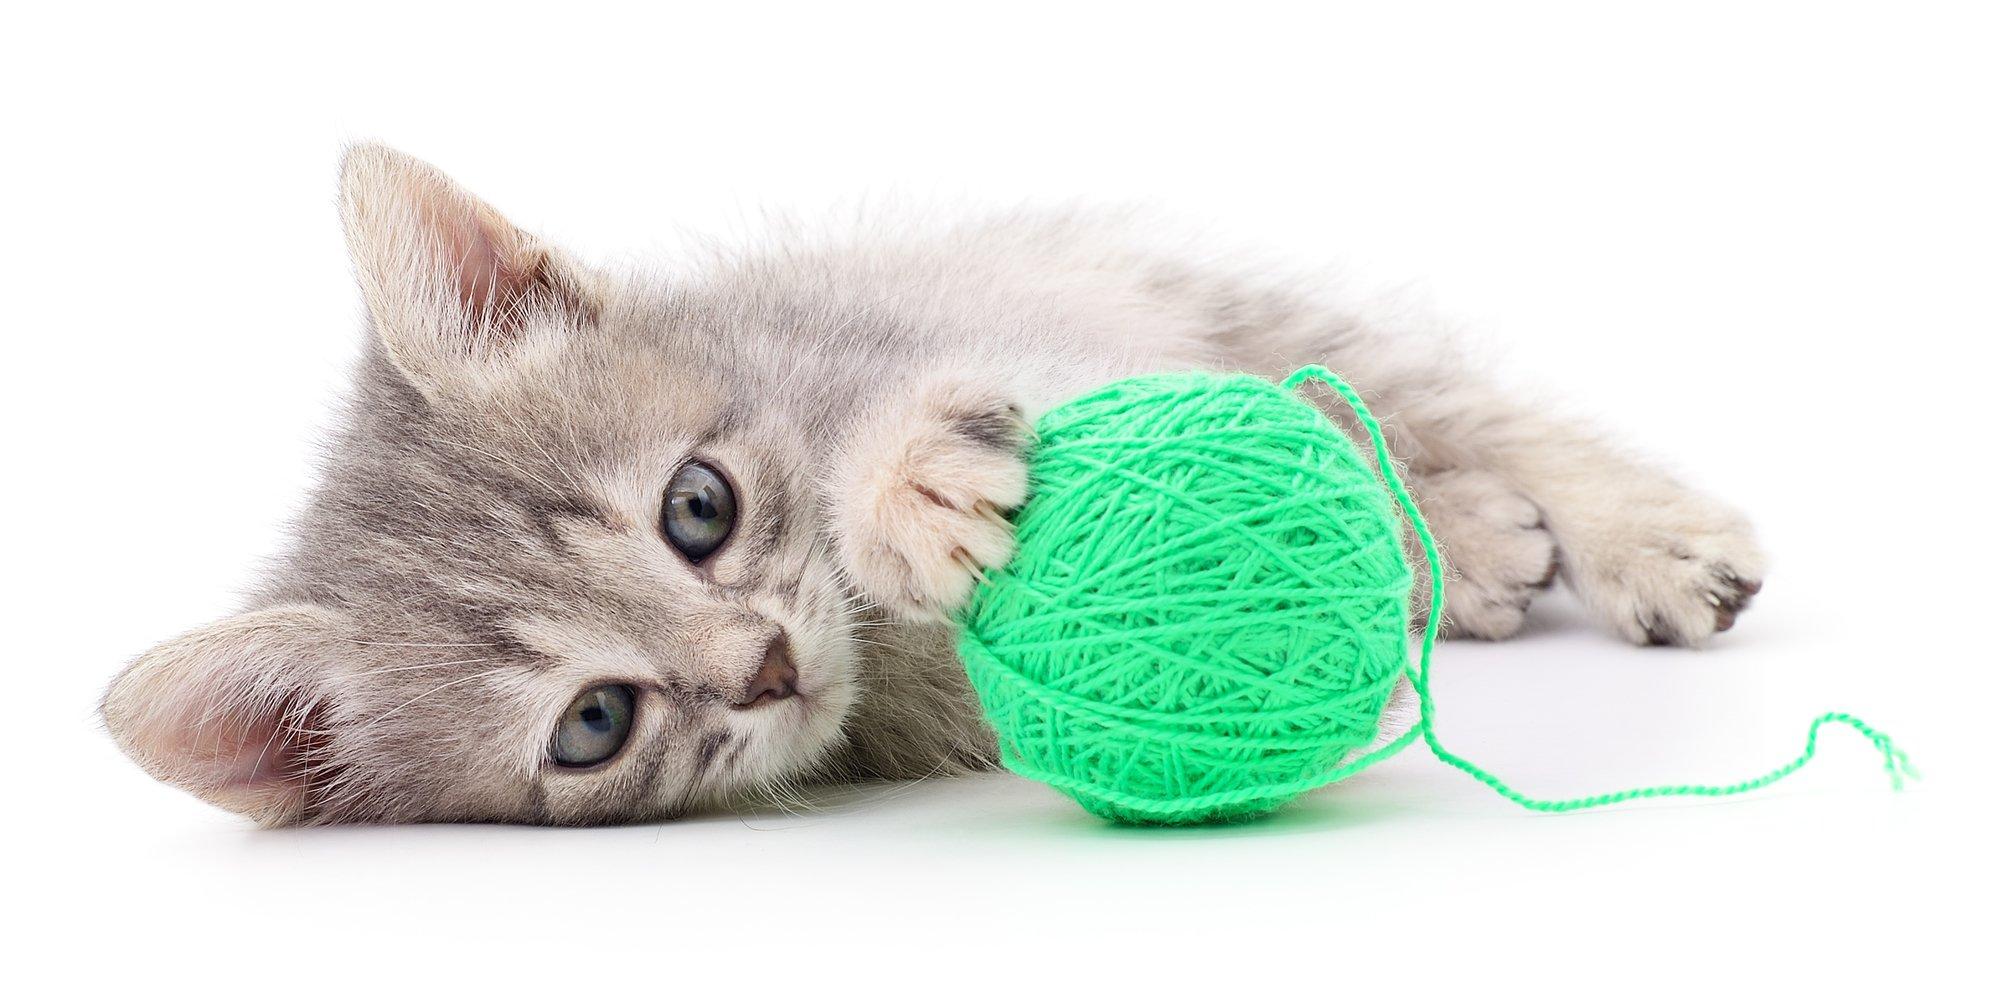 yarn and kitten